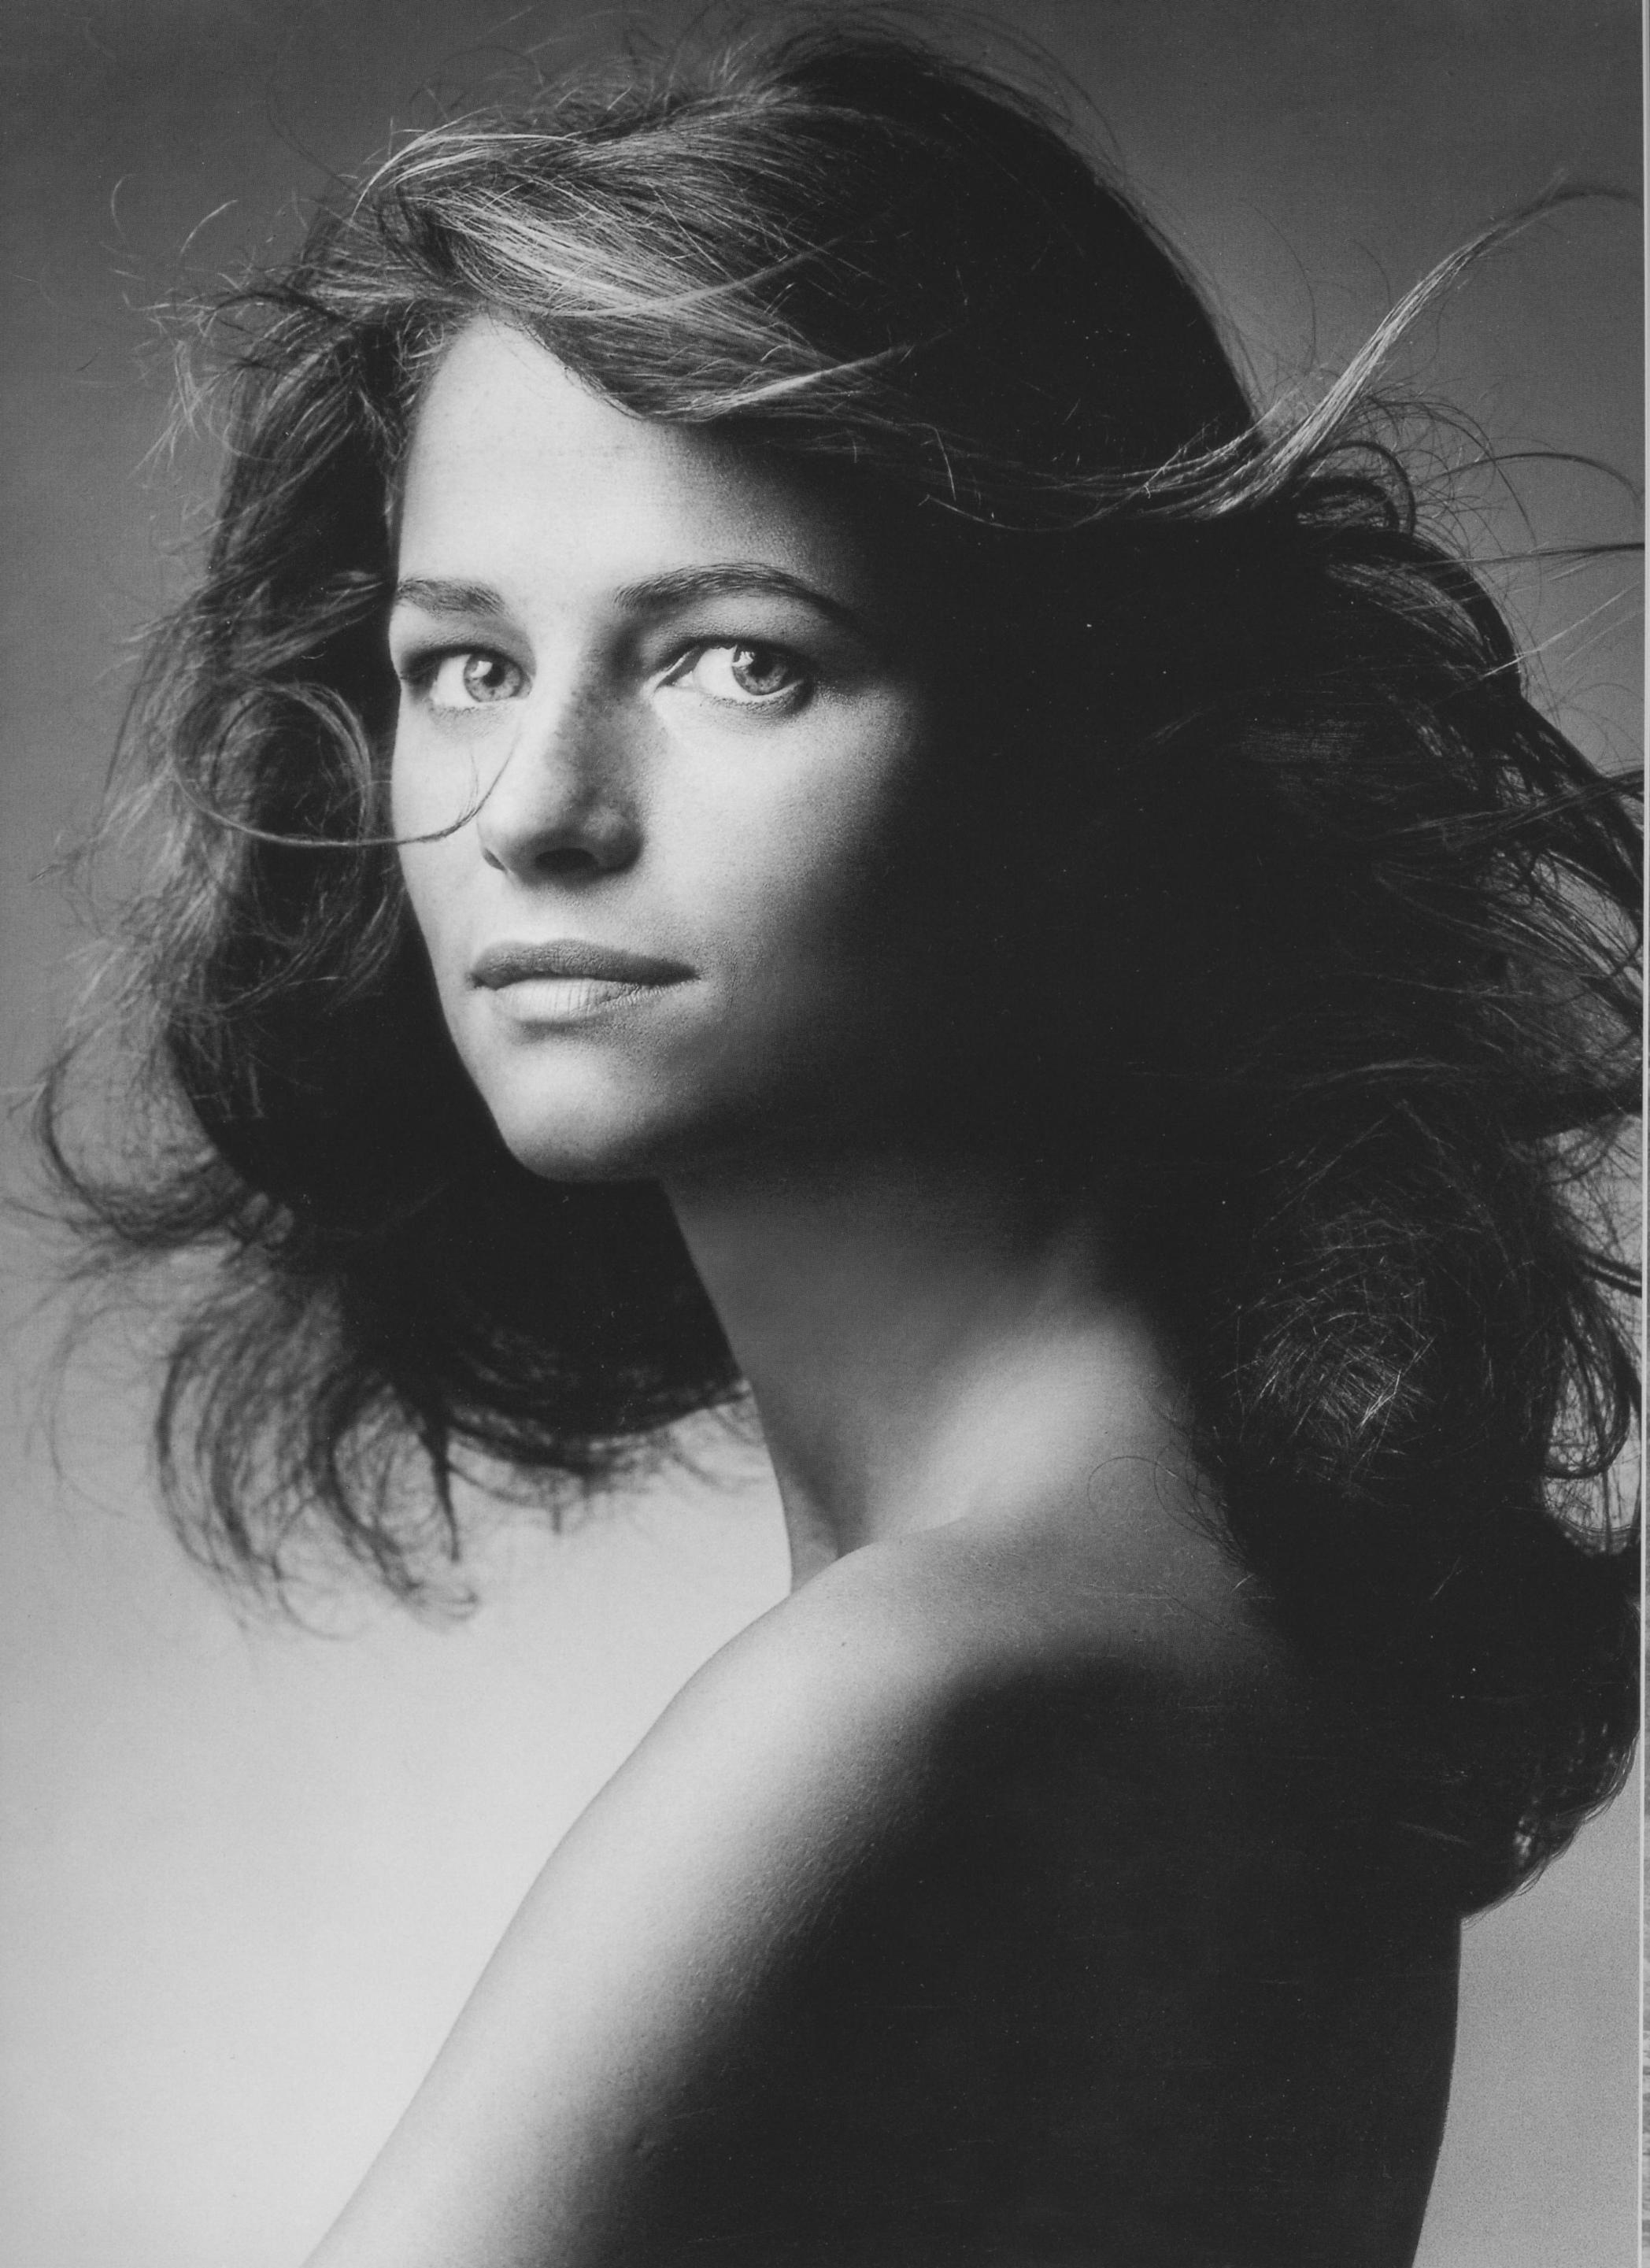 Charlotte Rampling (http://www.imdb.com/name/nm0001648